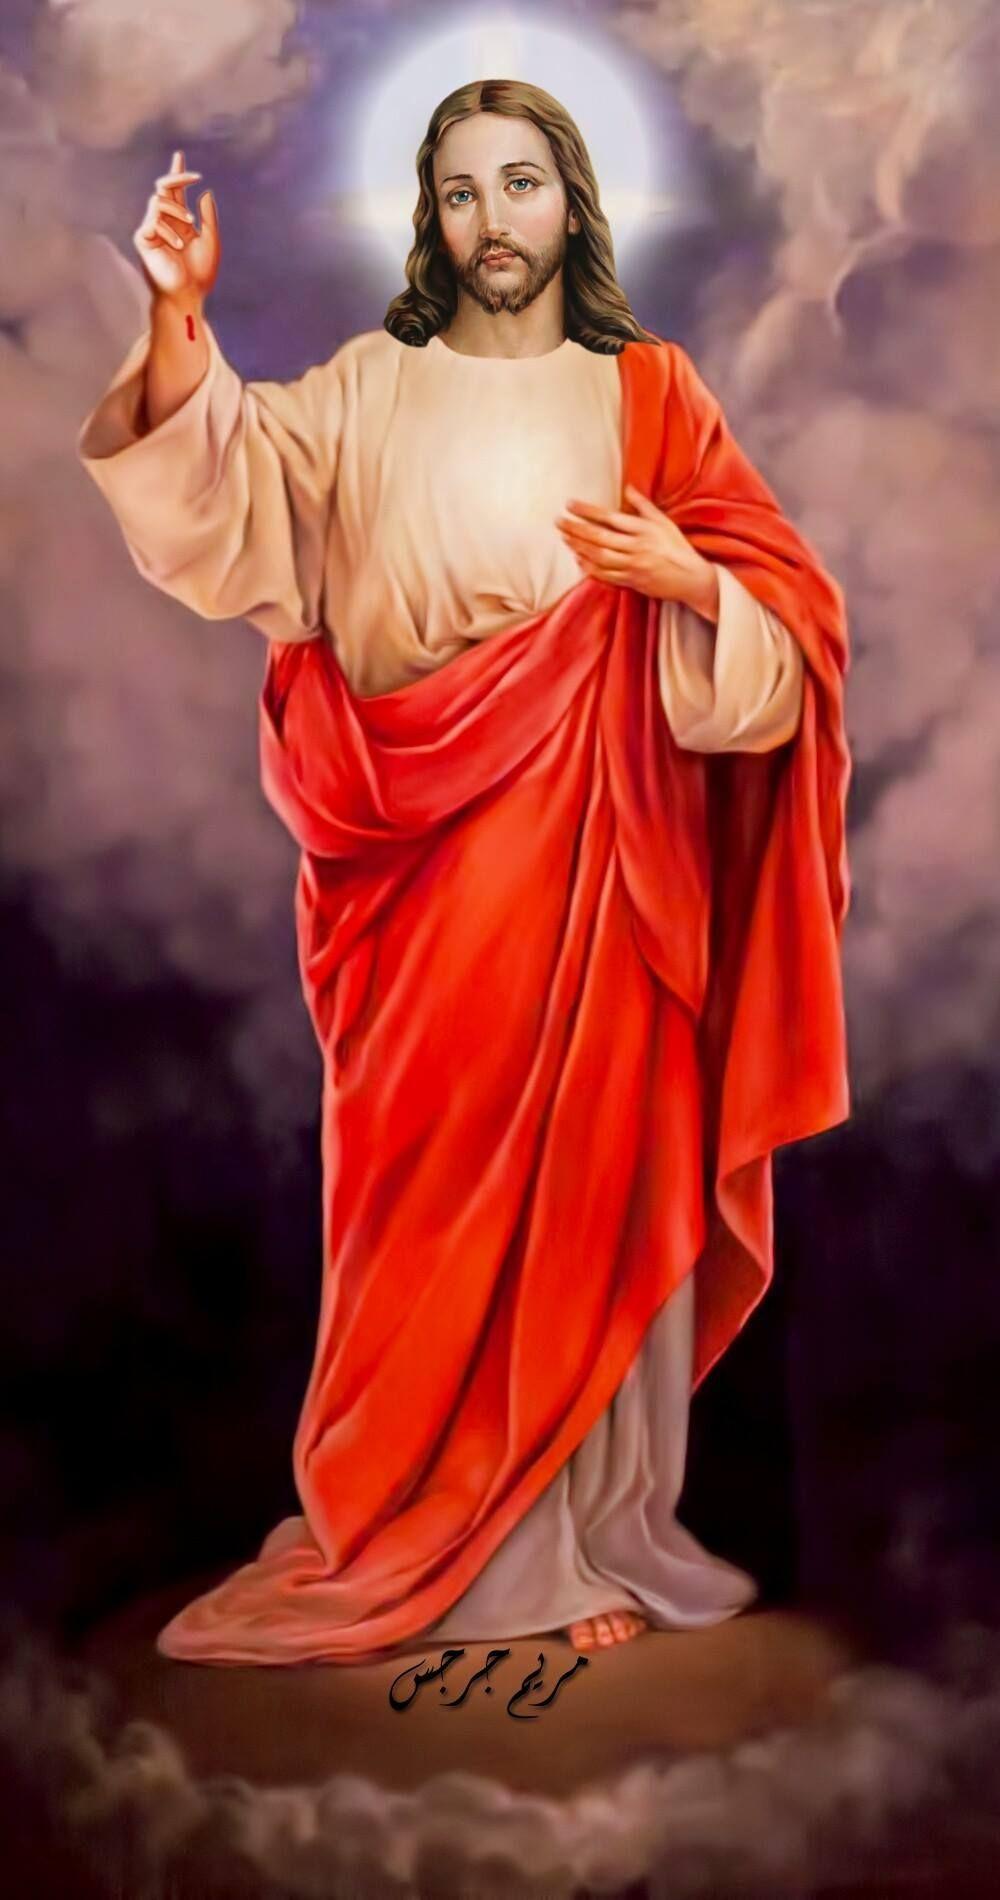 Ảnh về chúa jesus